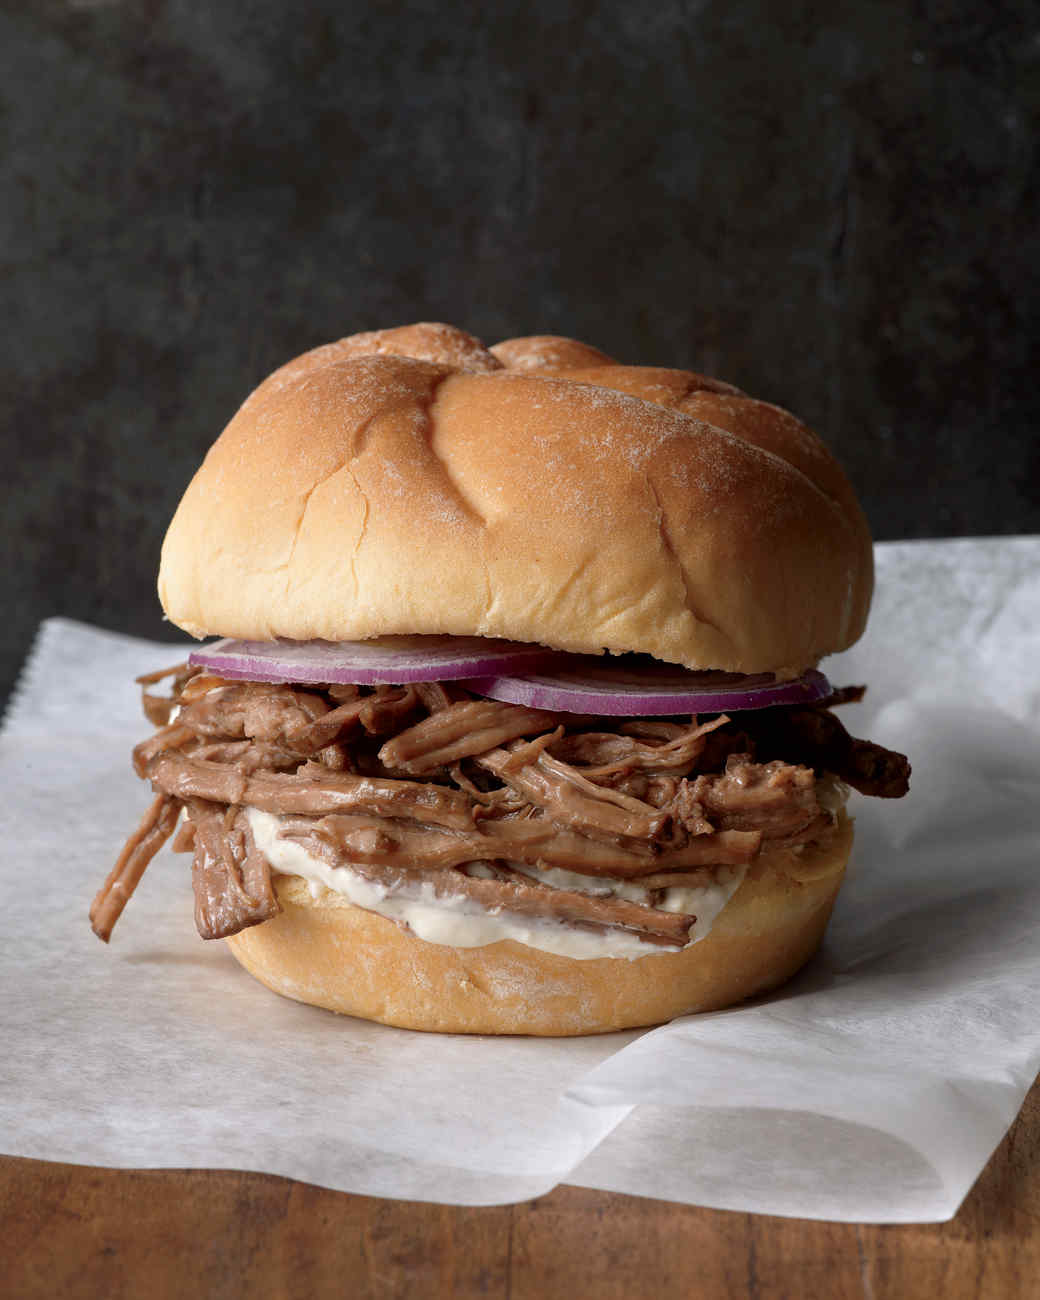 shredded beef on sandwich bun